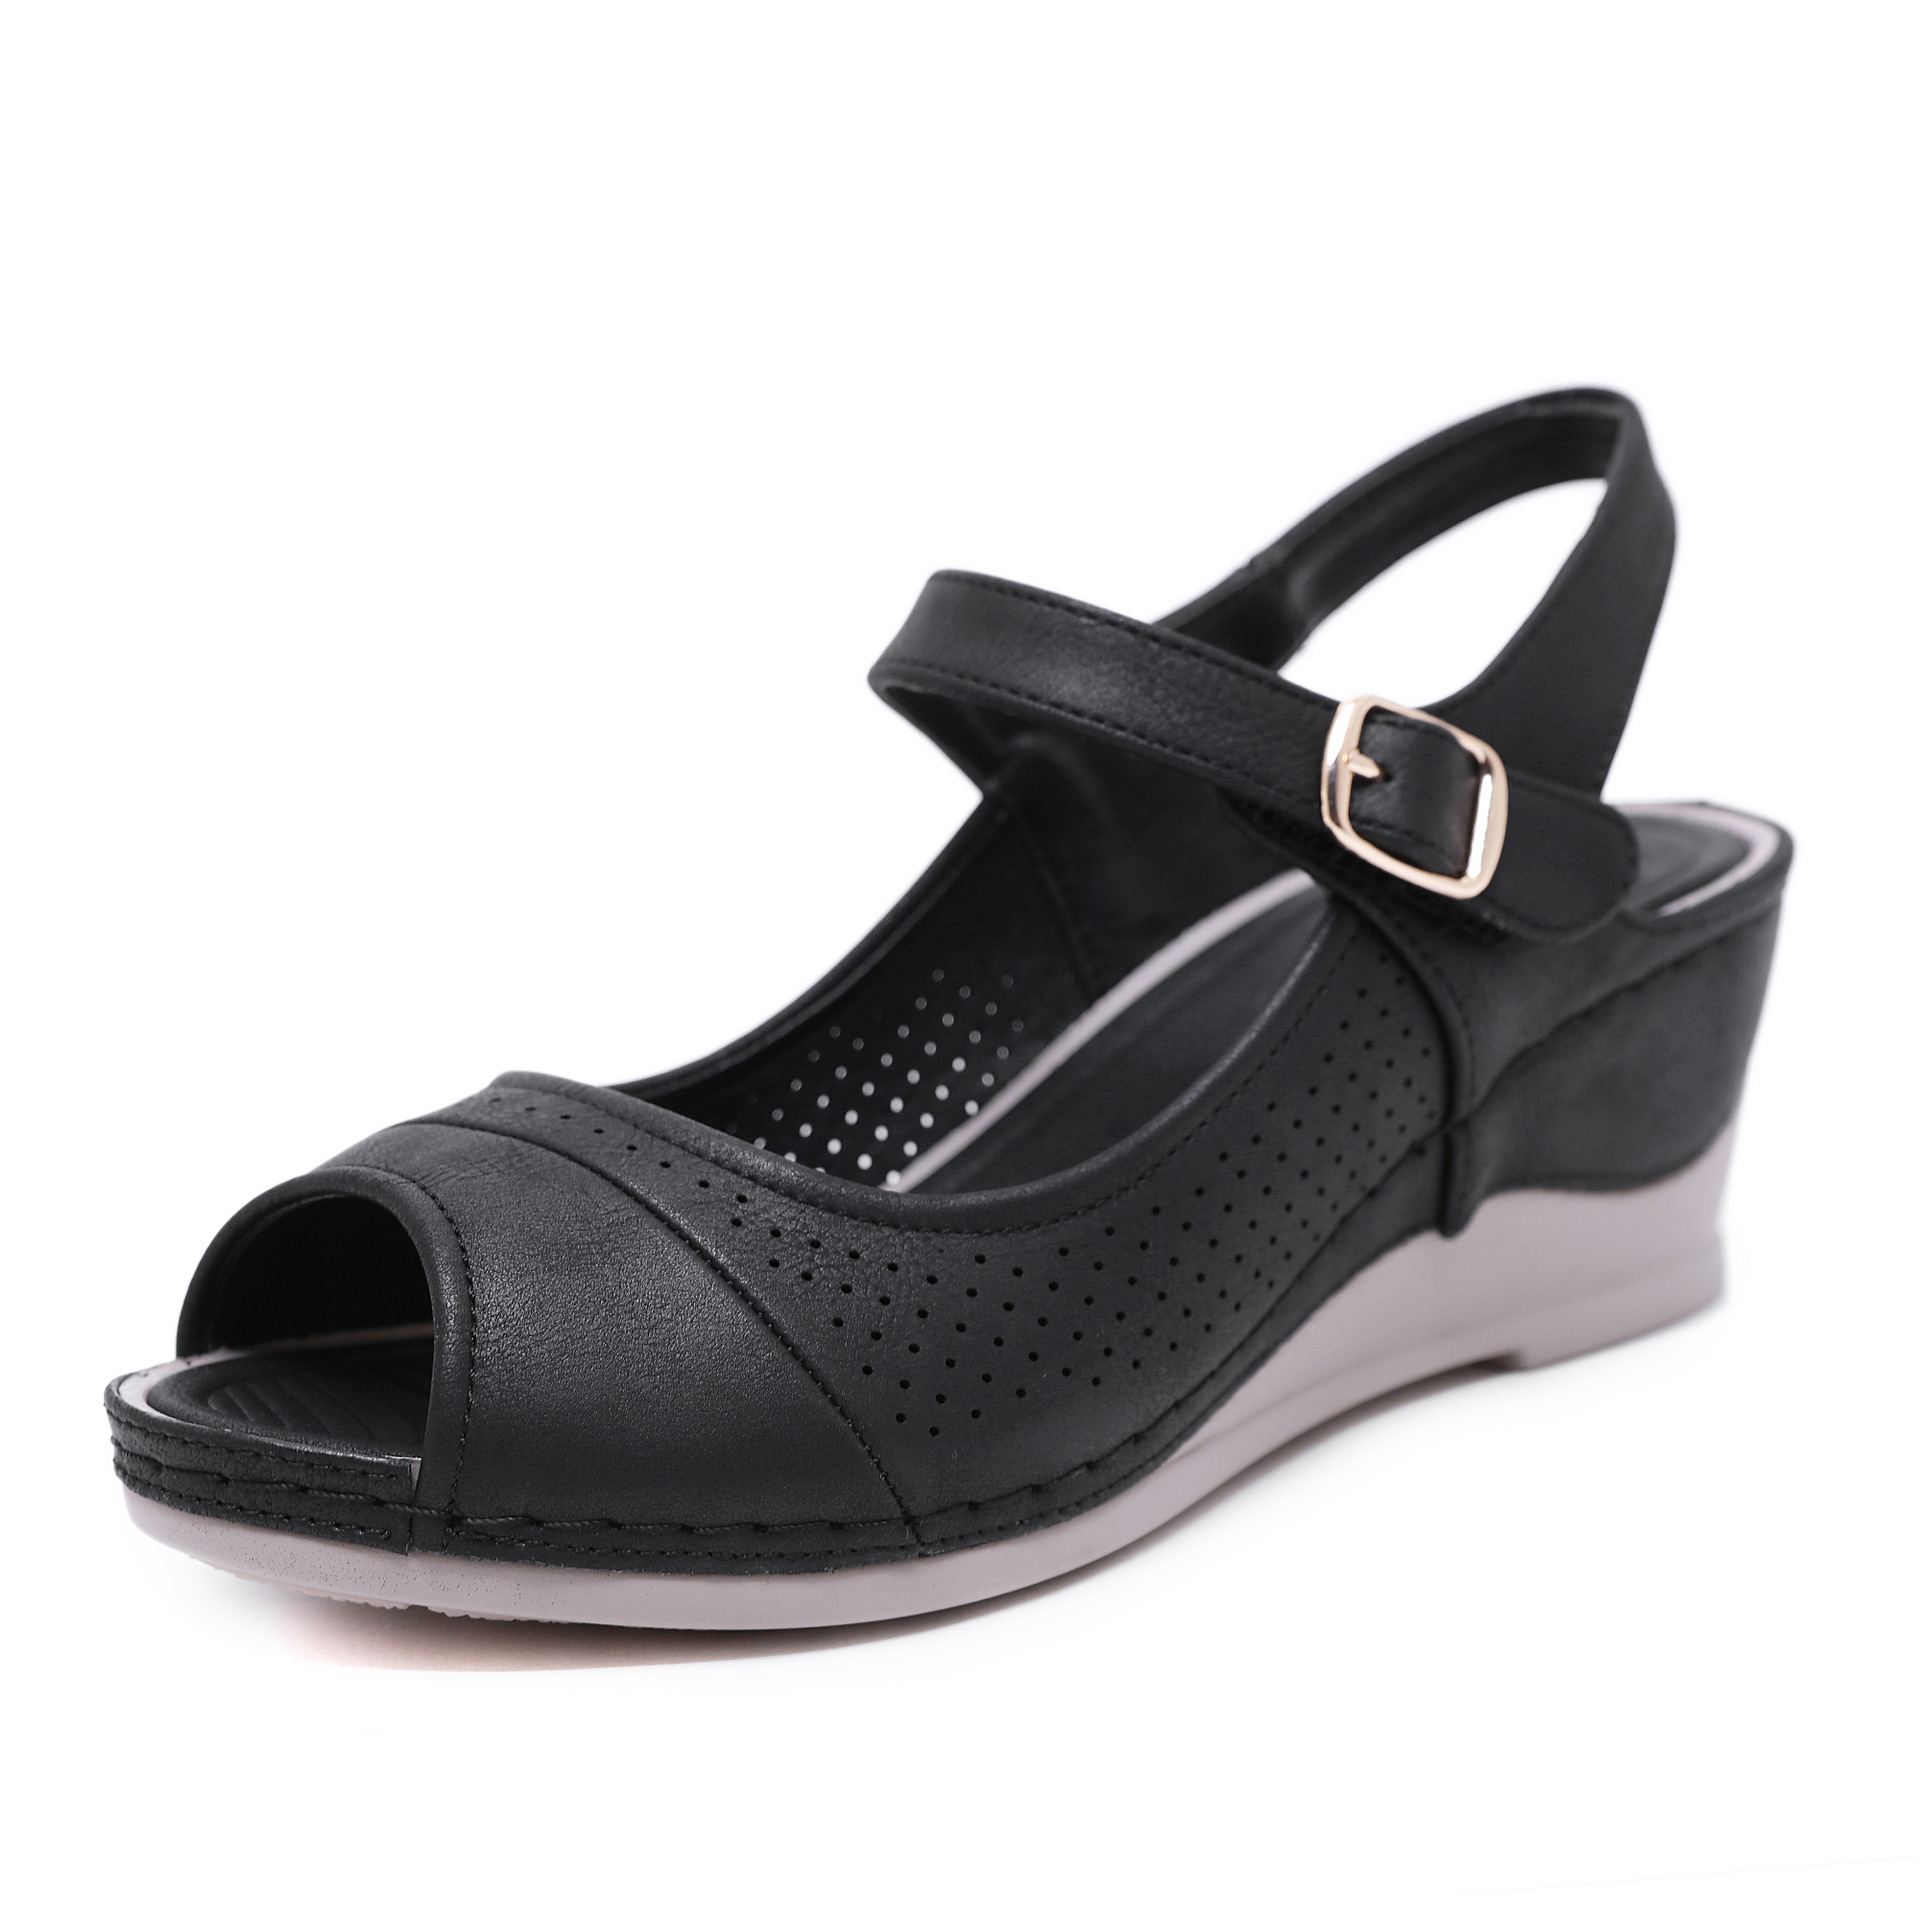 CINESSD 2020 Size 36-42 Women Platform Wedge Sandals Ladies Vacation Beach Black Shoes Bucket Open Toe Gladiator Sandals